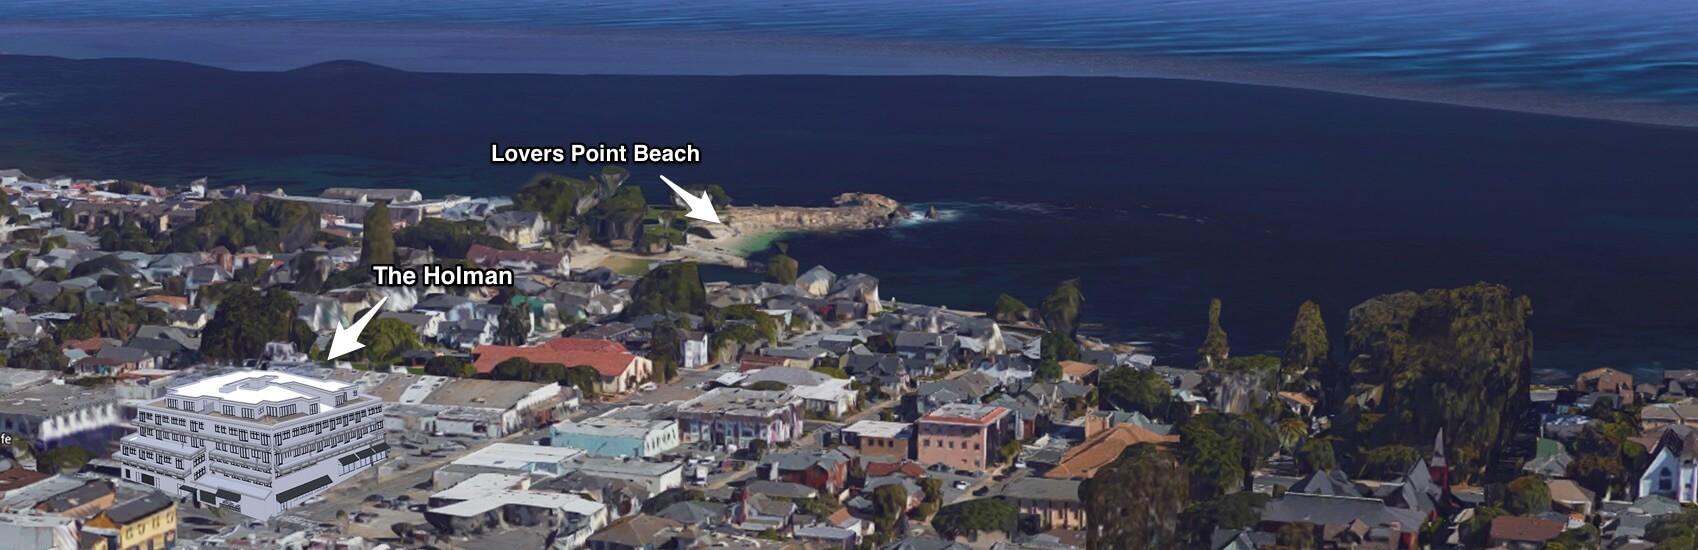 Apartment Marketing Ideas - Google Earth